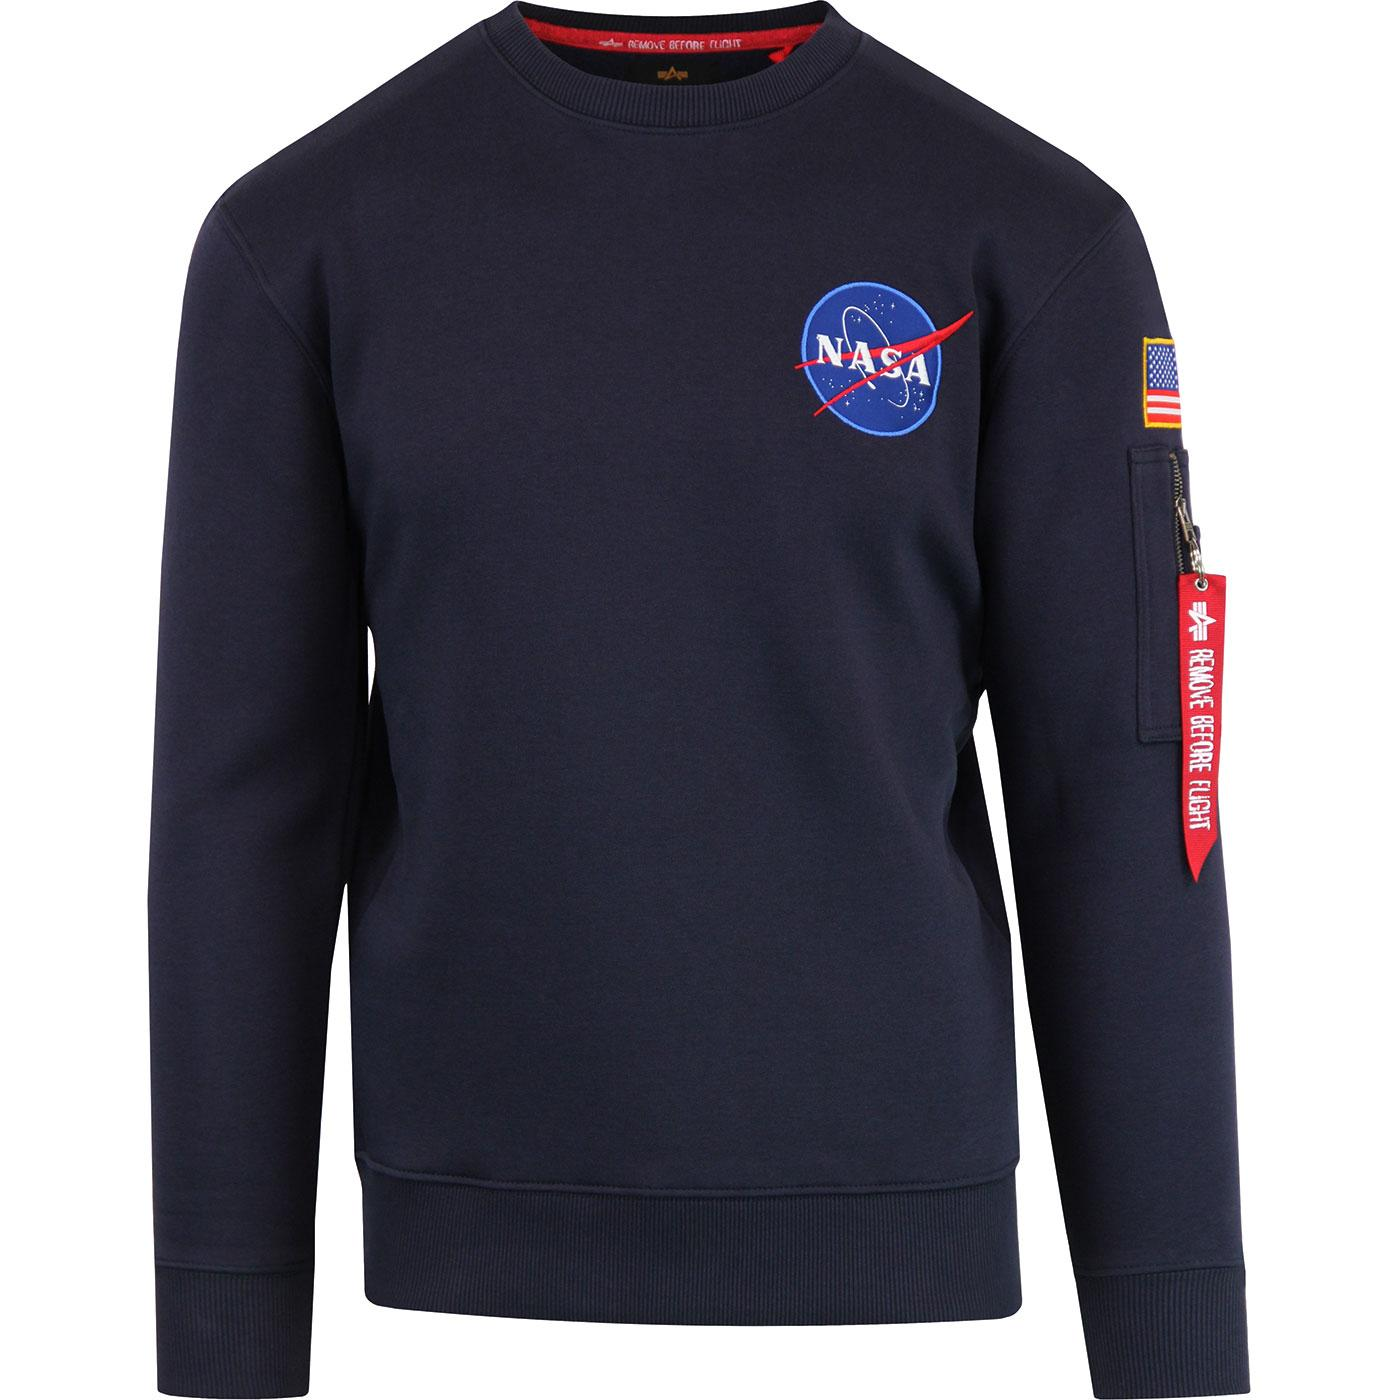 65a4fa2a2 ALPHA INDUSTRIES NASA Space Shuttle Sweater in Blue